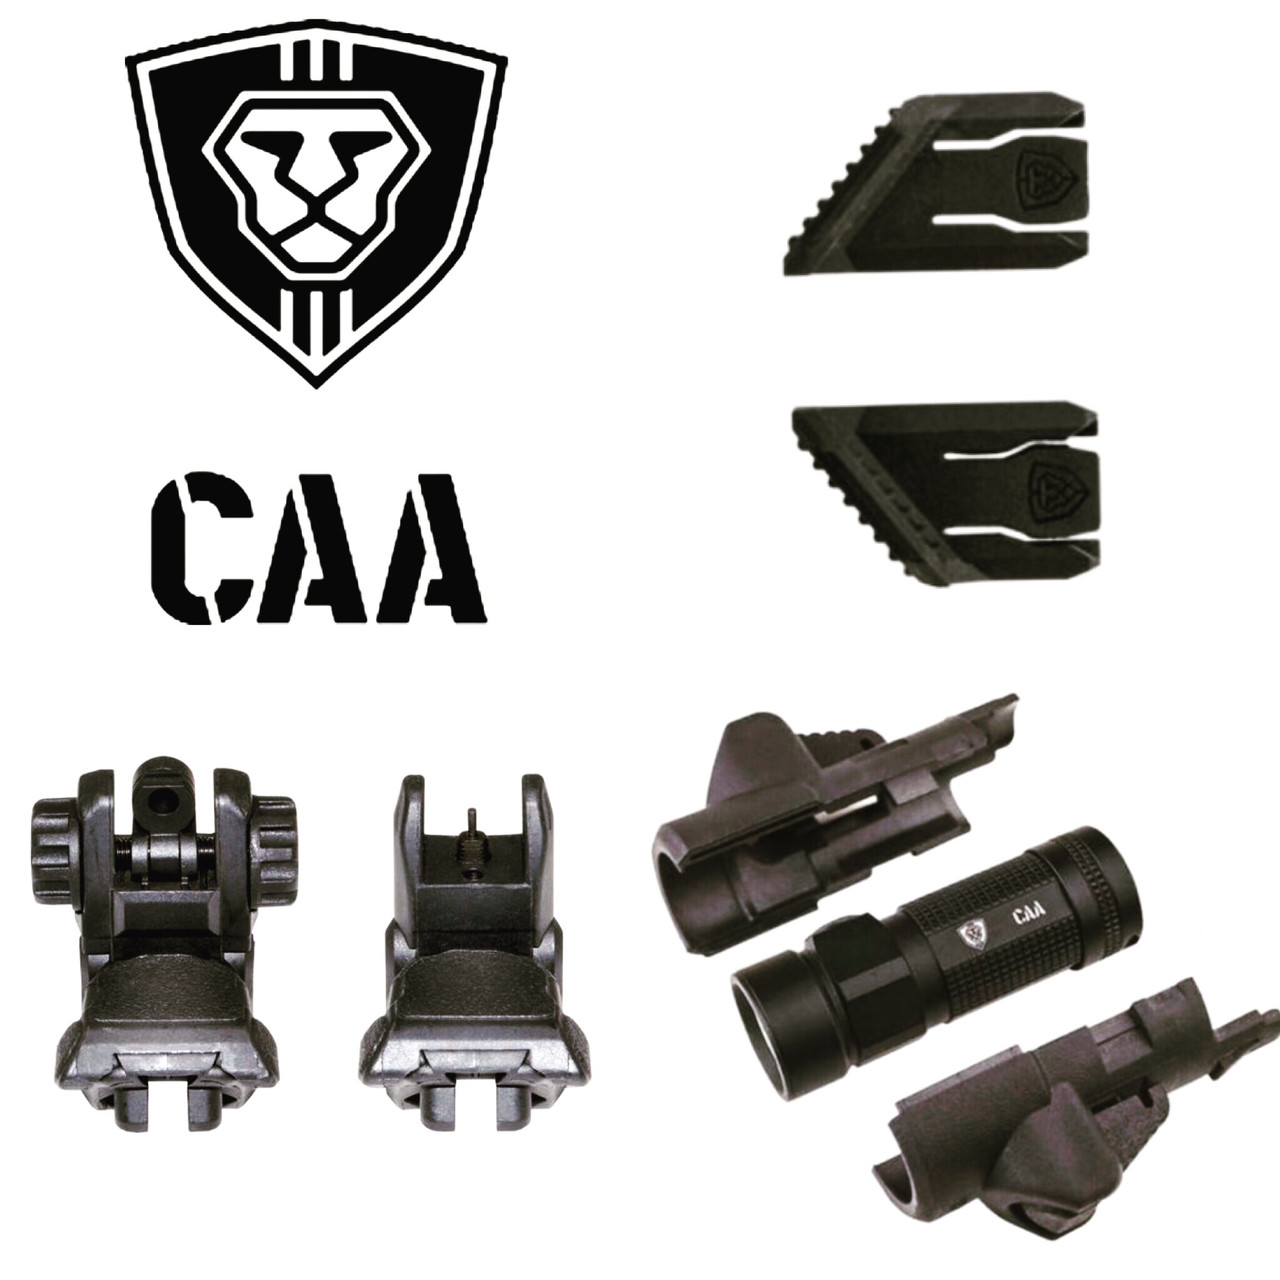 MCK Micro Conversion Kit Primary Combo Glock 17/19/19X/22/23/31/32/45